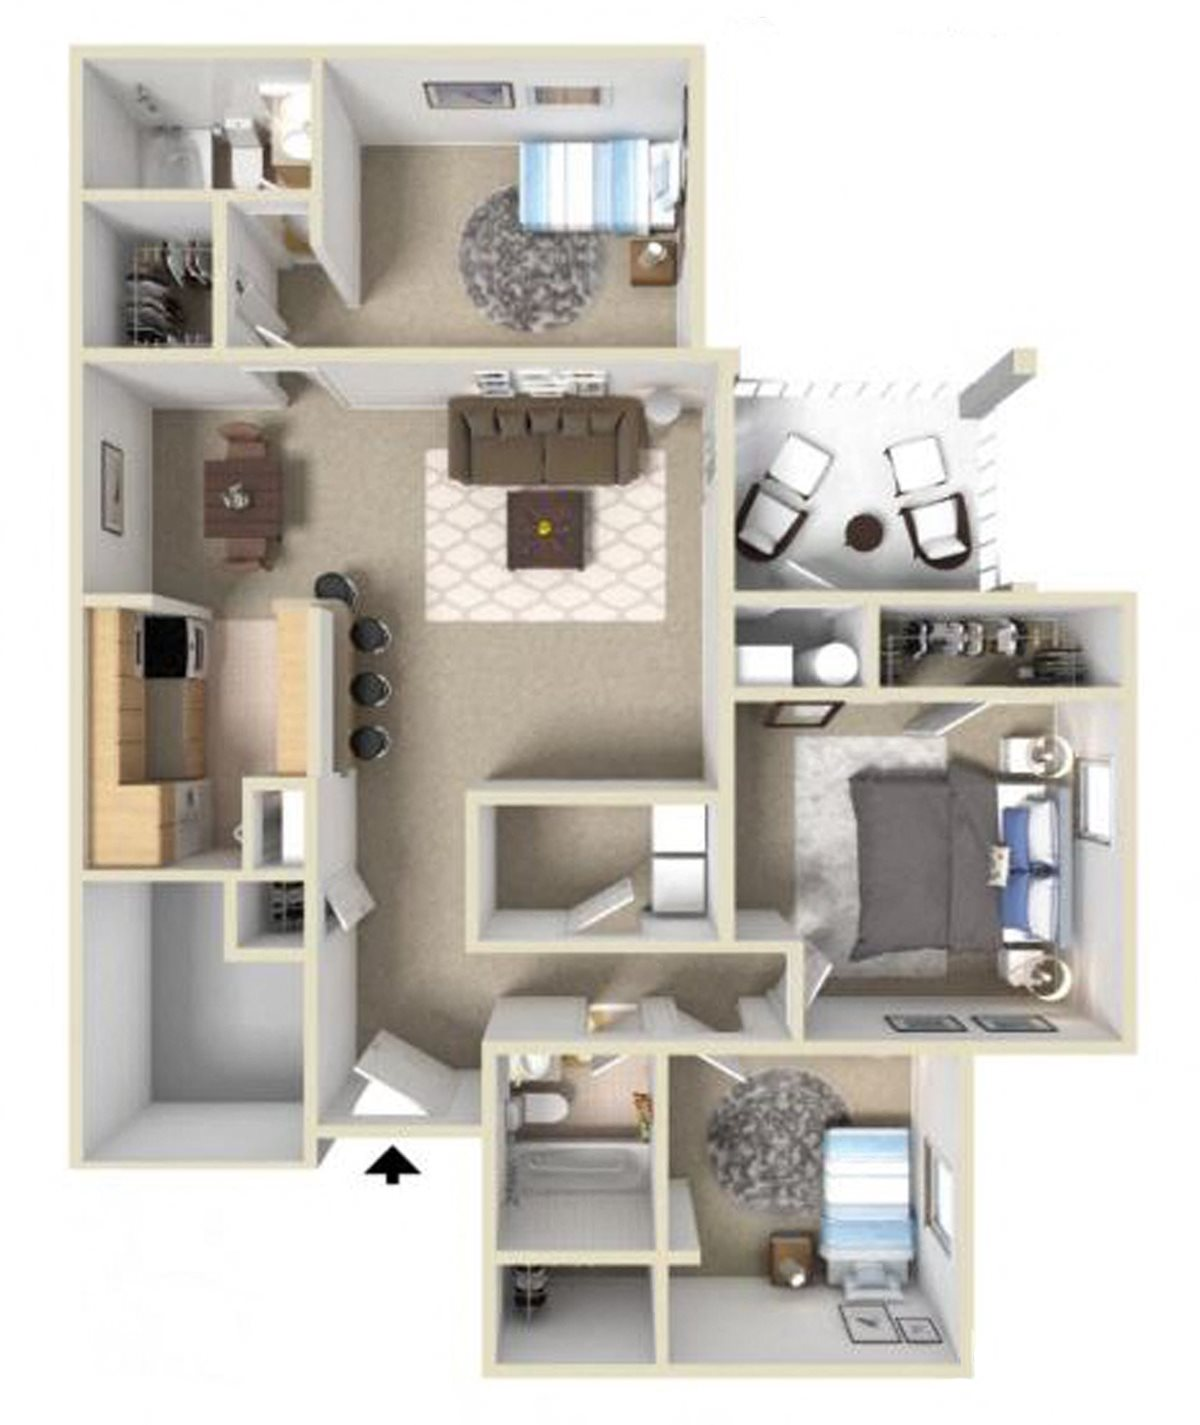 Westover III Floor Plan at Ashton Creek Apartments in Chester VA